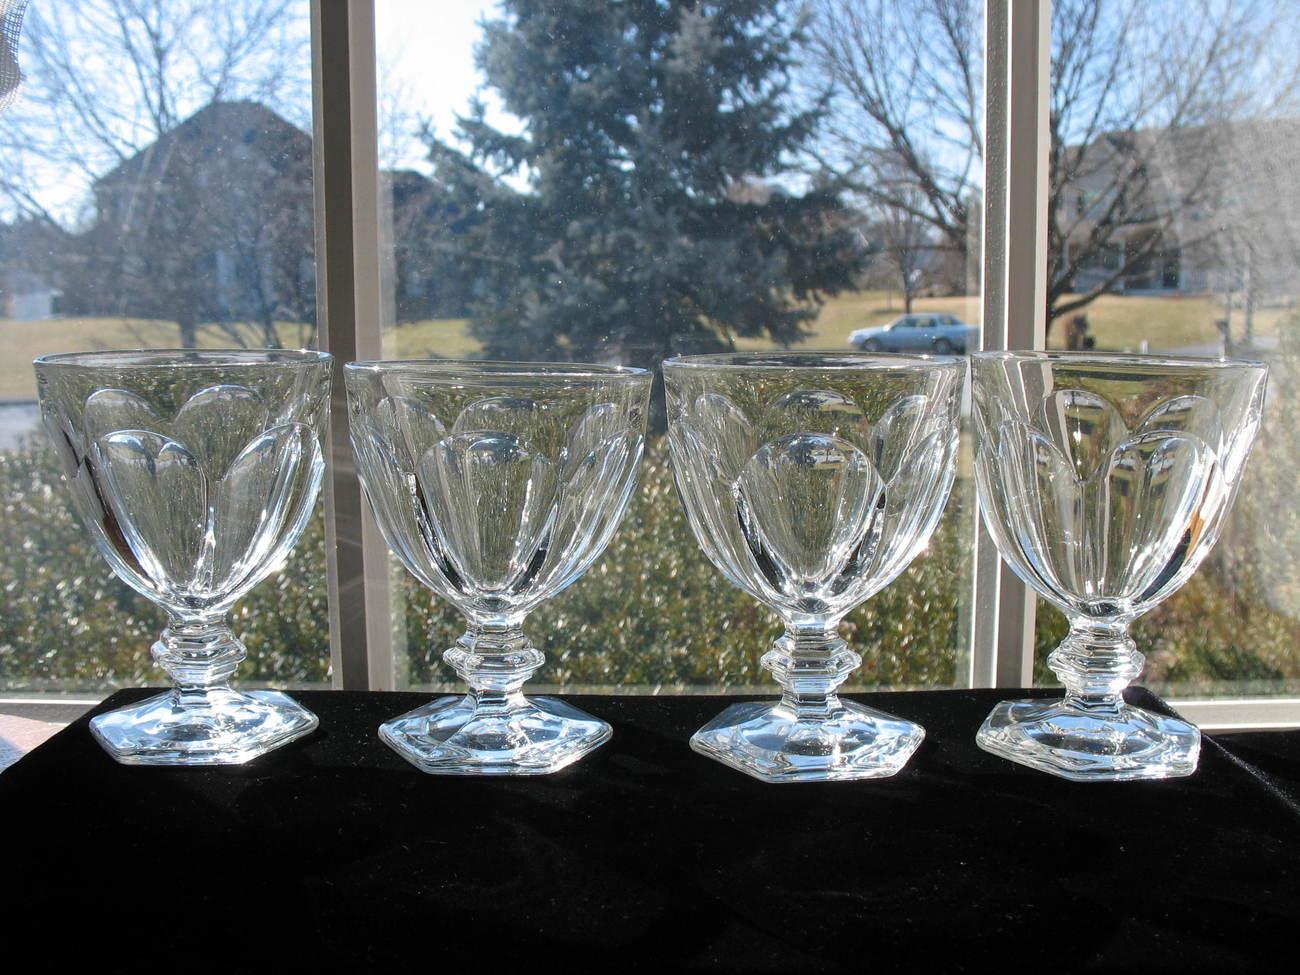 Heisey Antique Puritan Goblets - Set of 4